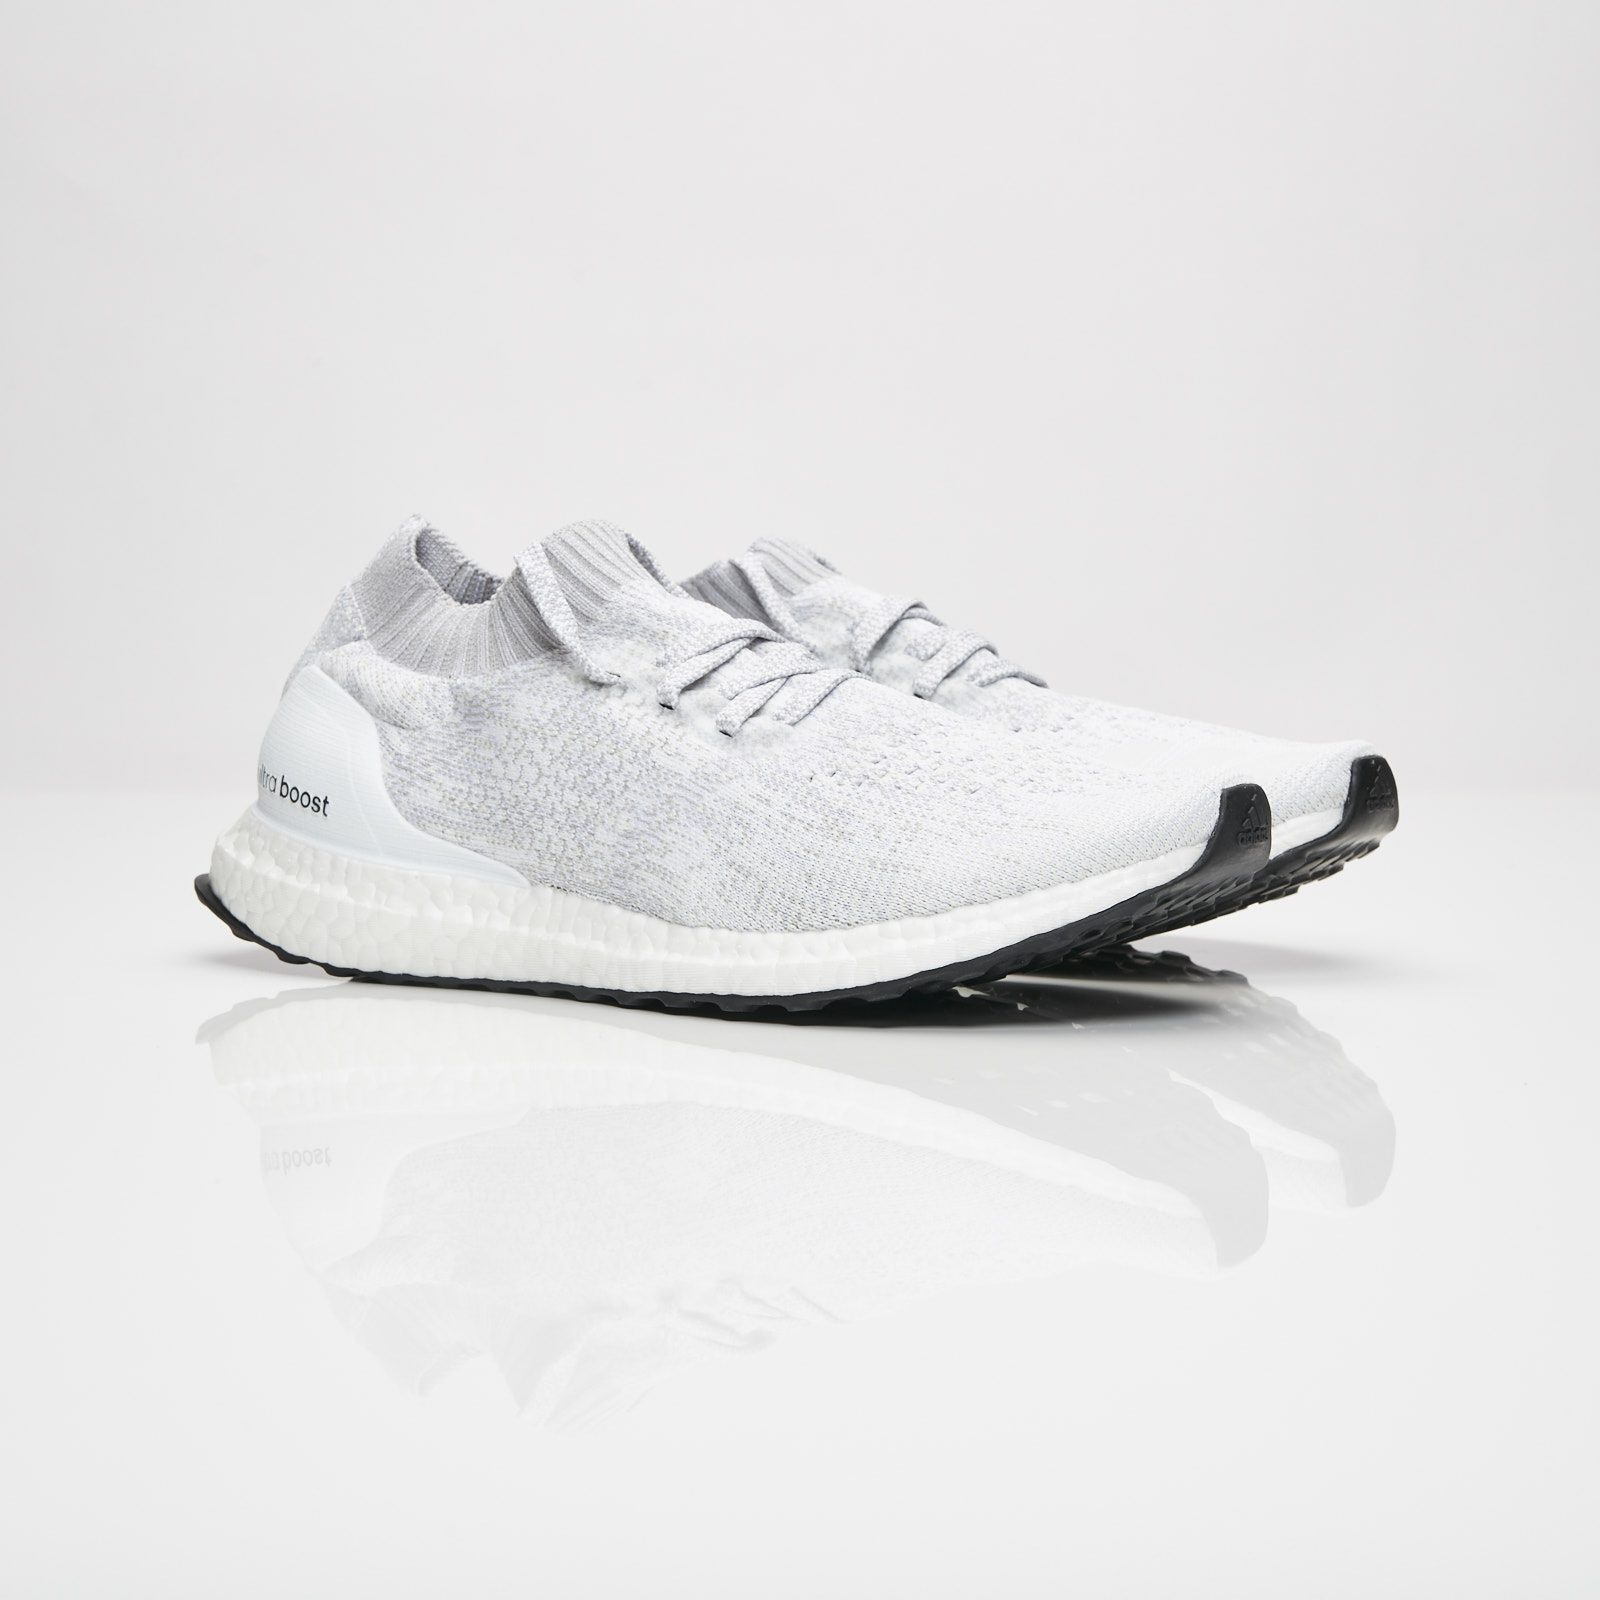 3c94da6a168 adidas UltraBOOST Uncaged - Da9157 - Sneakersnstuff